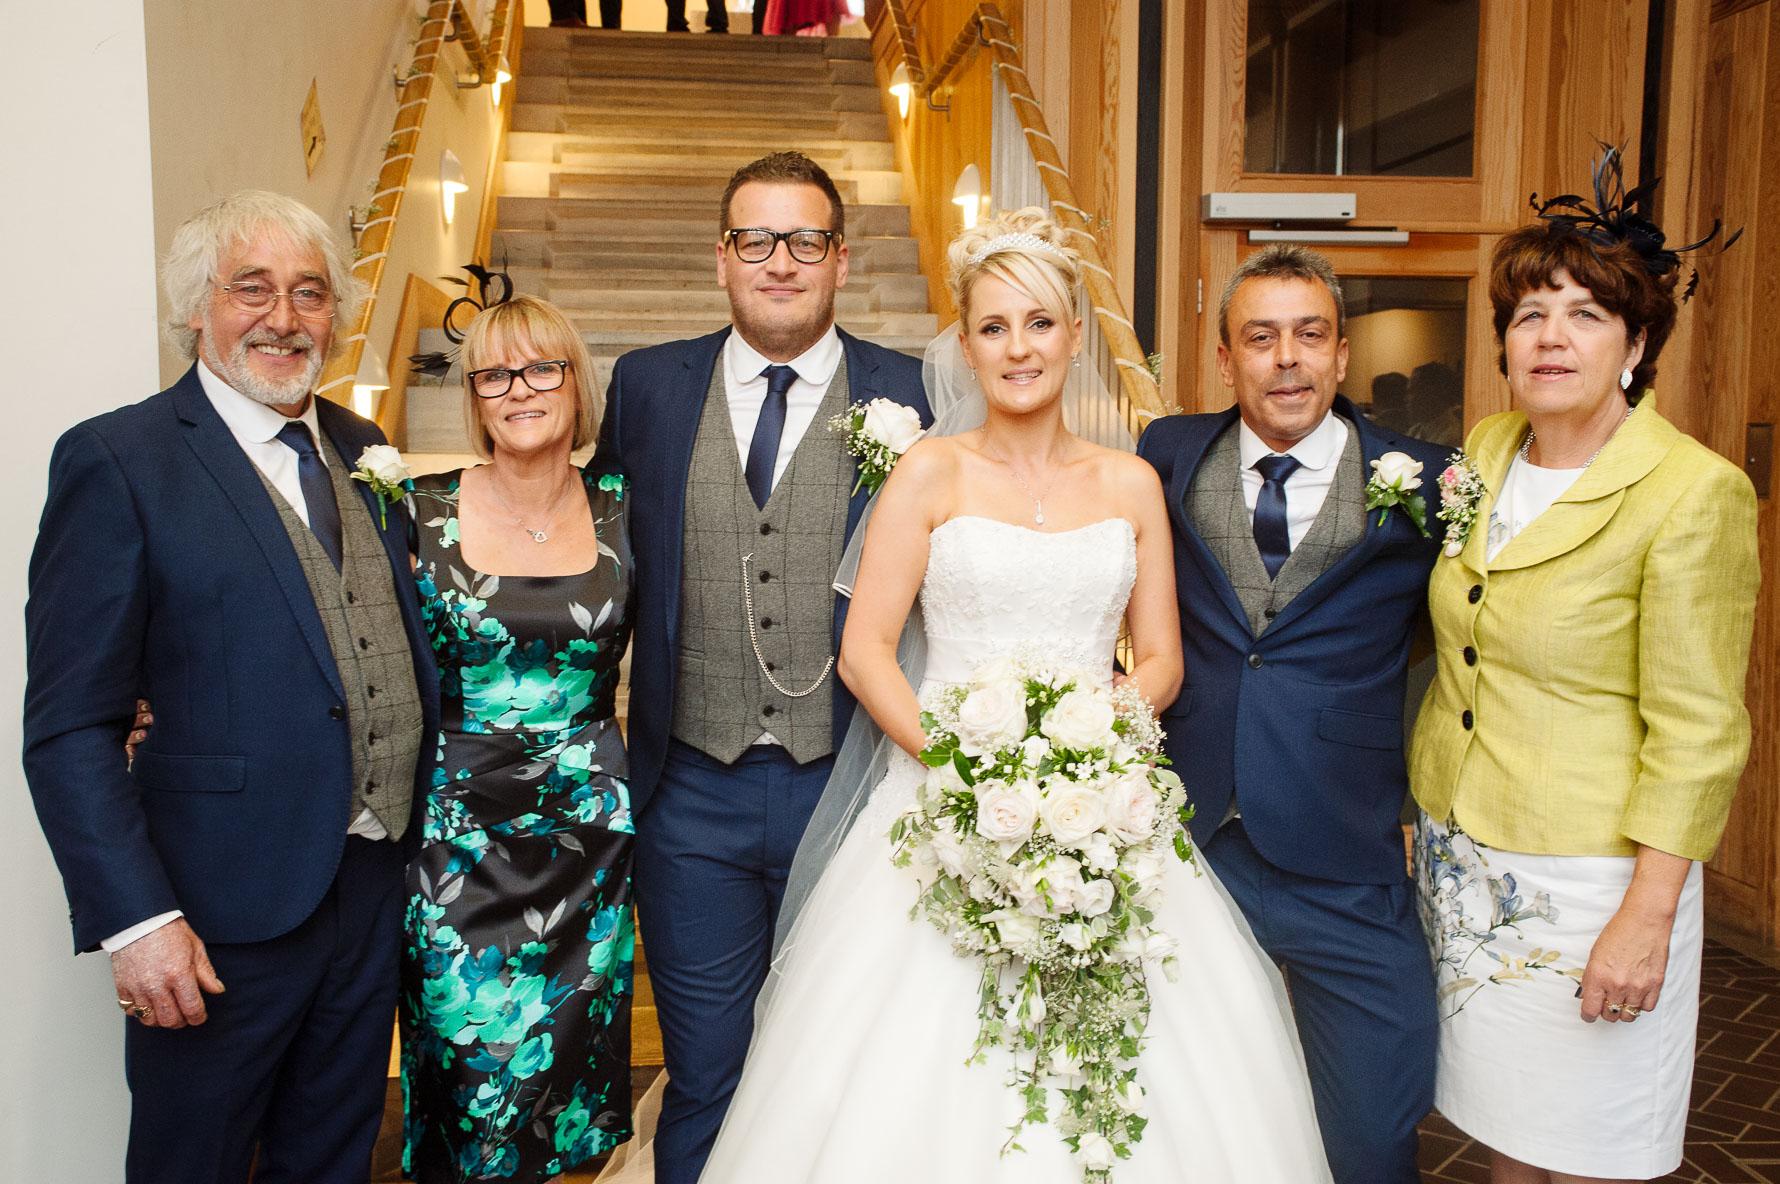 Canterbury Cathedral Lodge Wedding61-20141004 0969